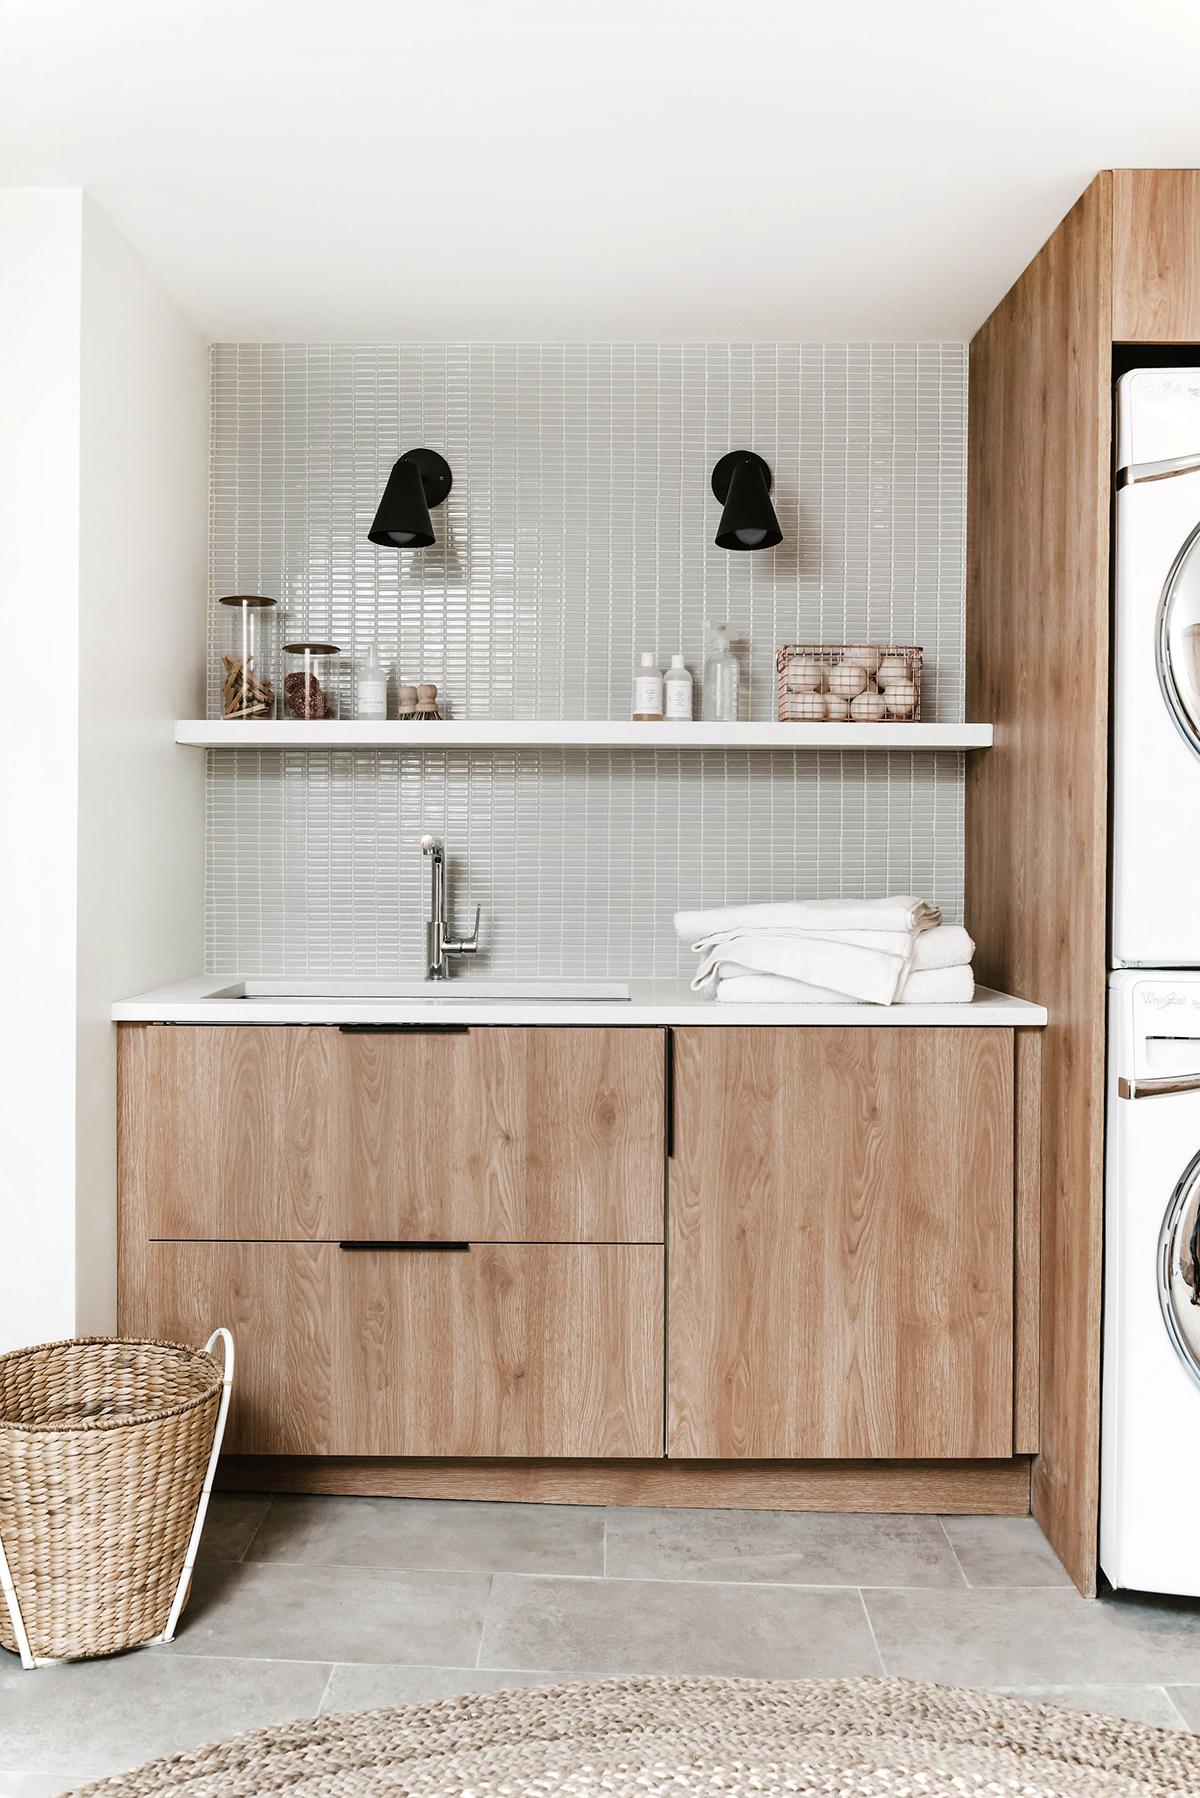 Photography   Kelli Kroneberger  /  Interior design   Anna Smith